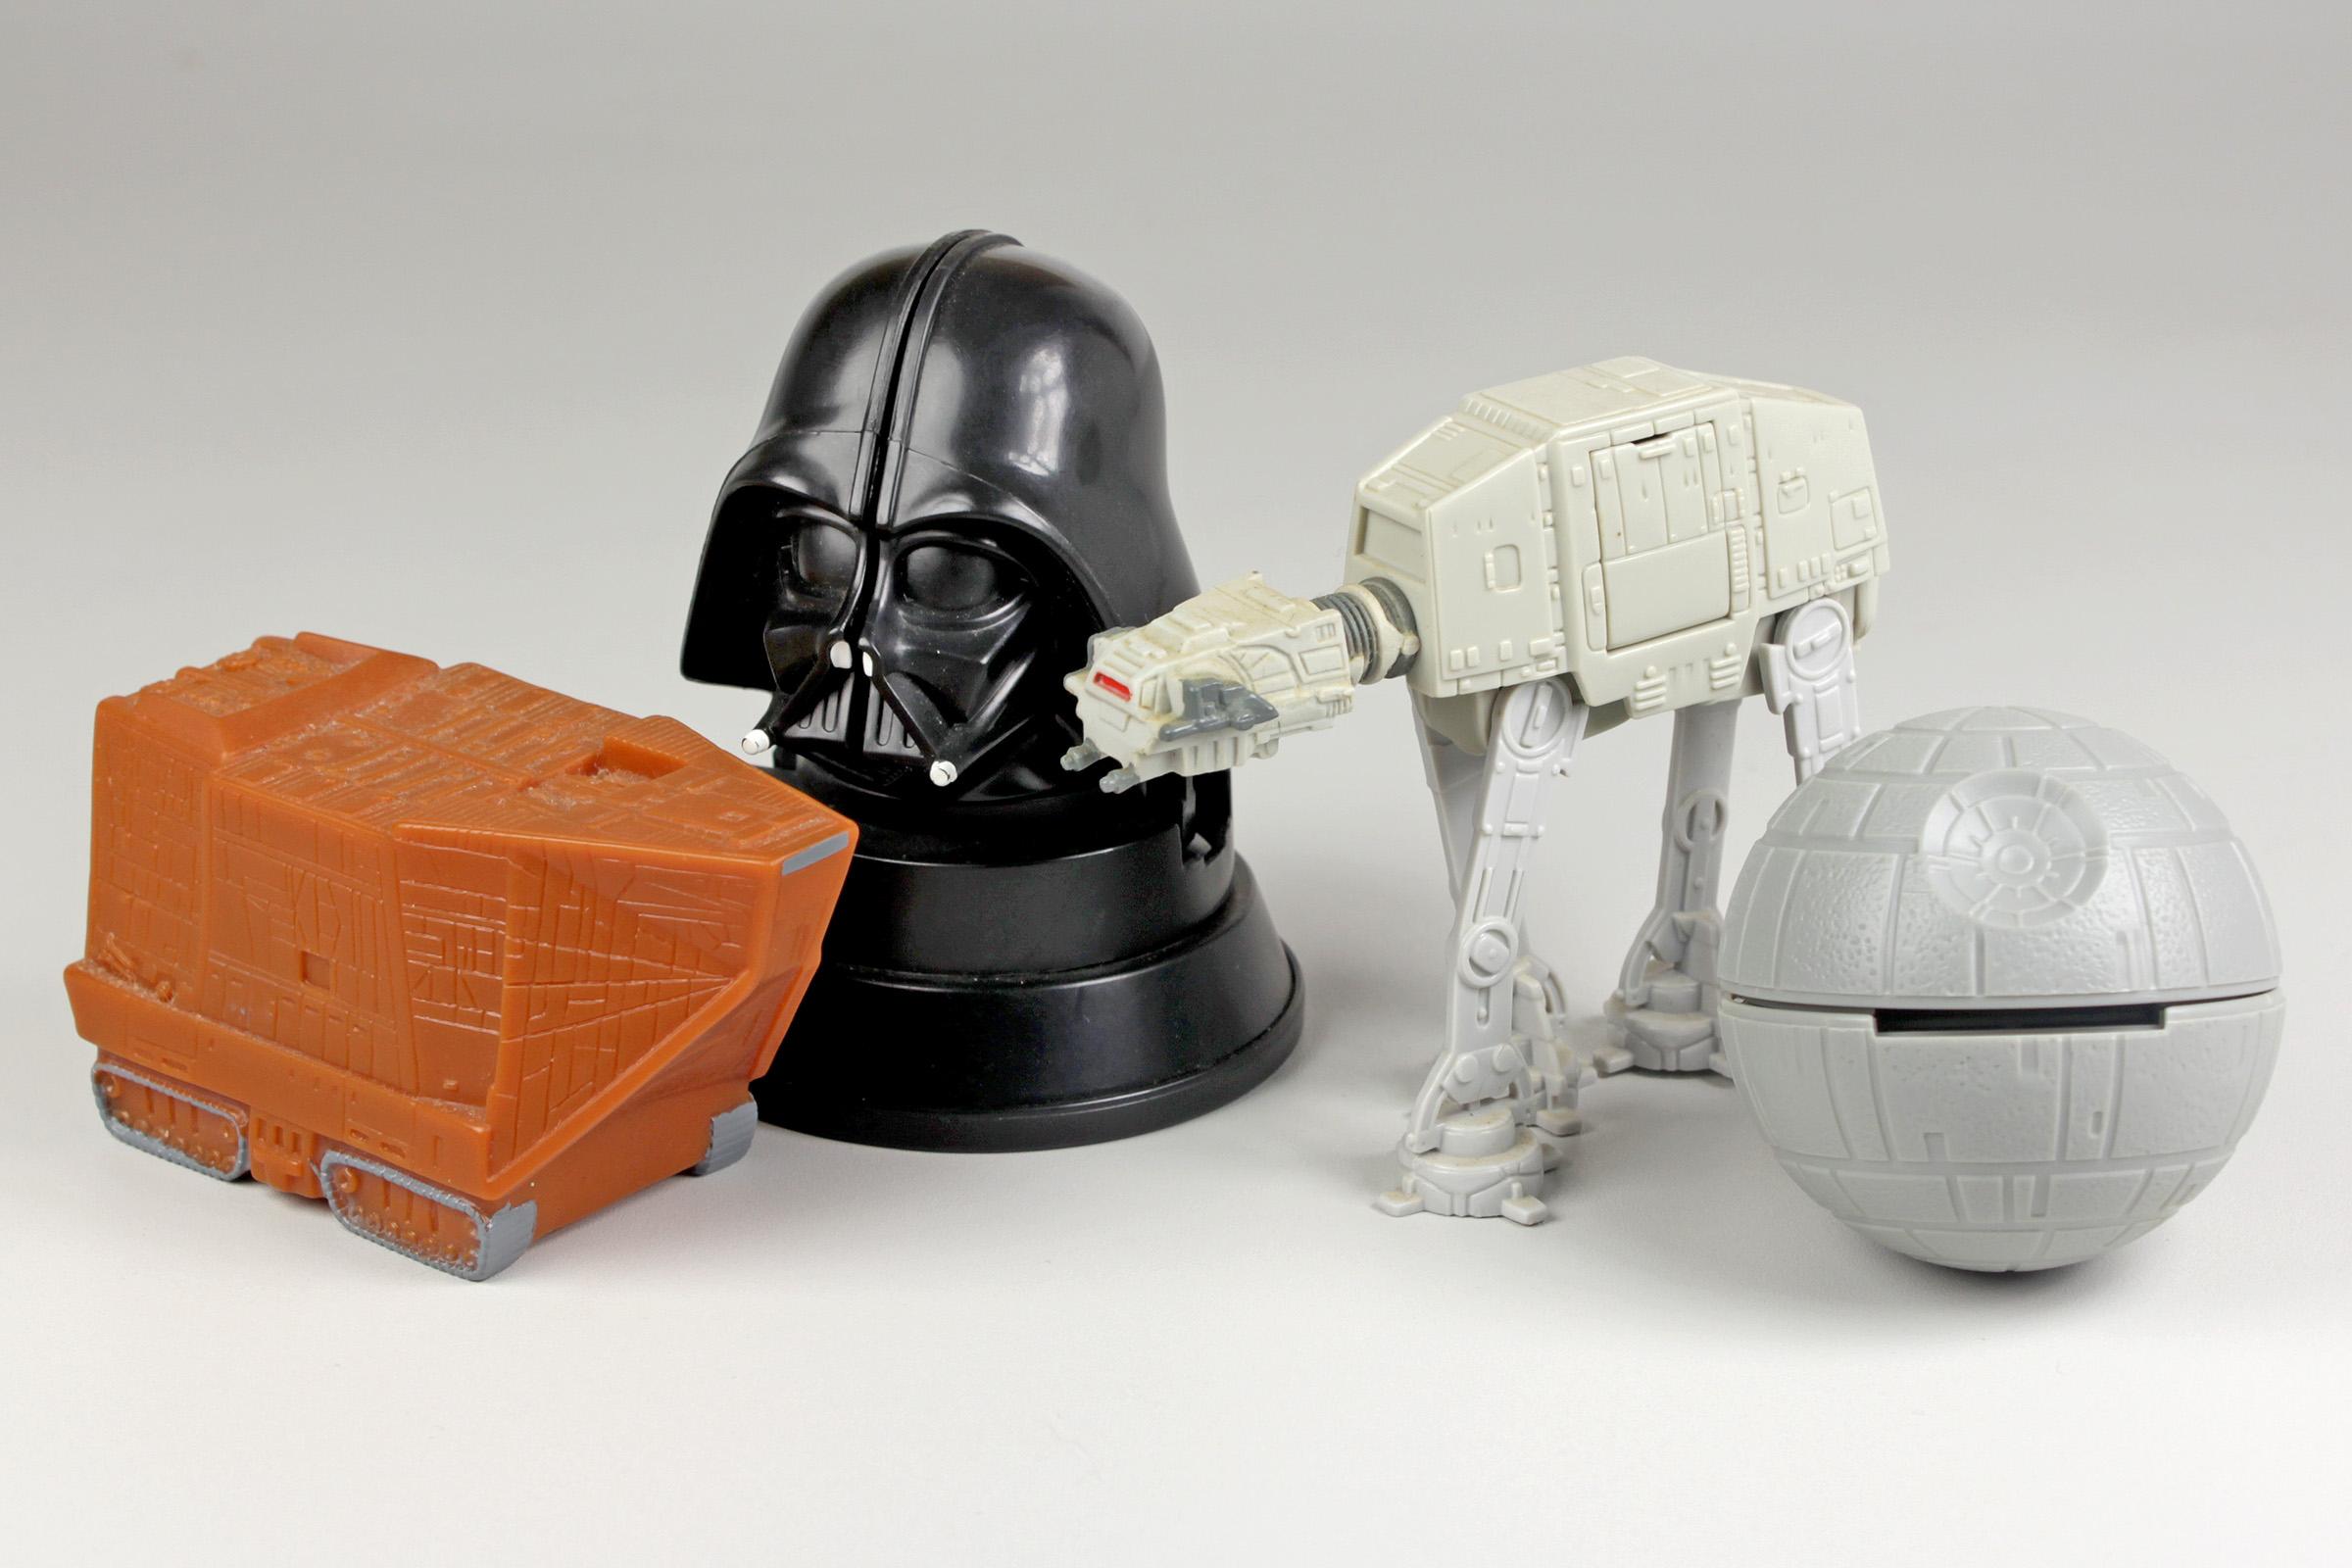 KFC Star Wars Action Toys